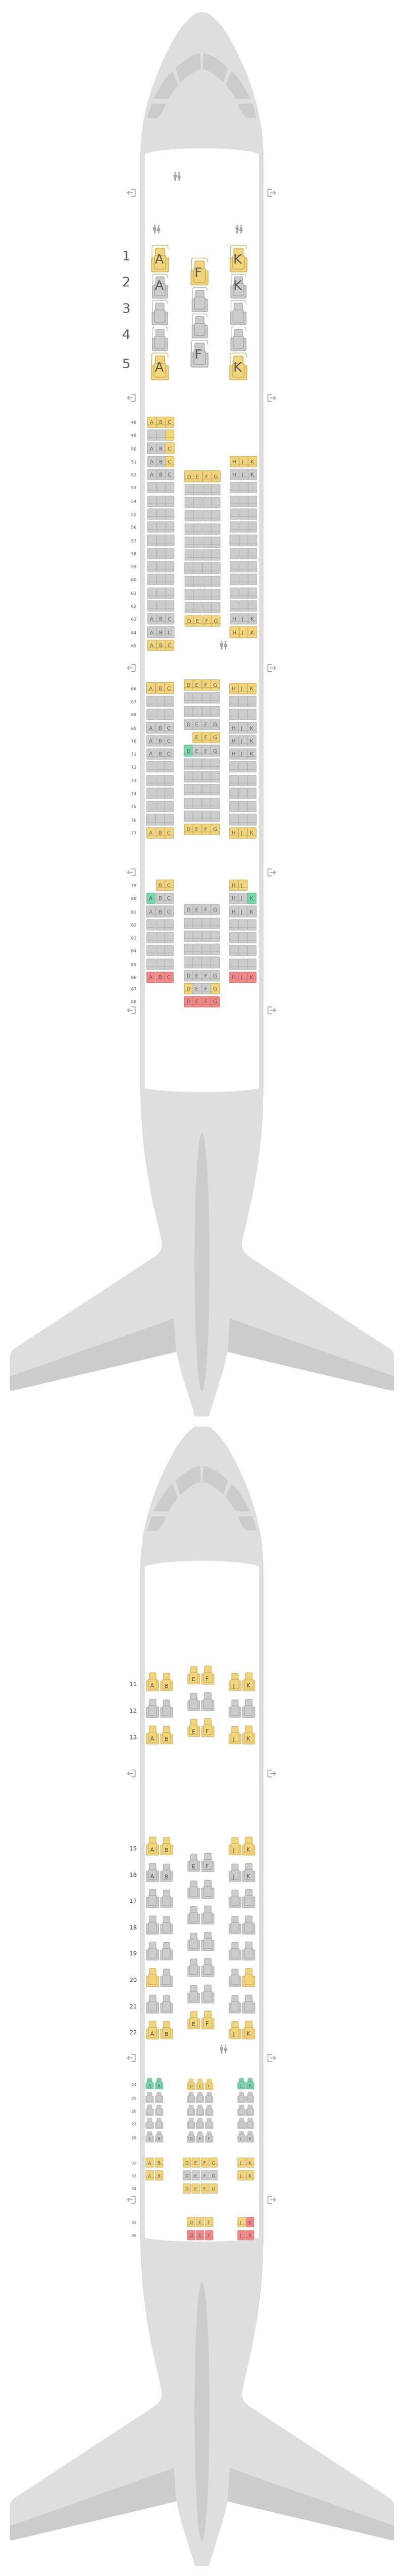 Seat Map Qantas Airbus A380-800 (388) v1